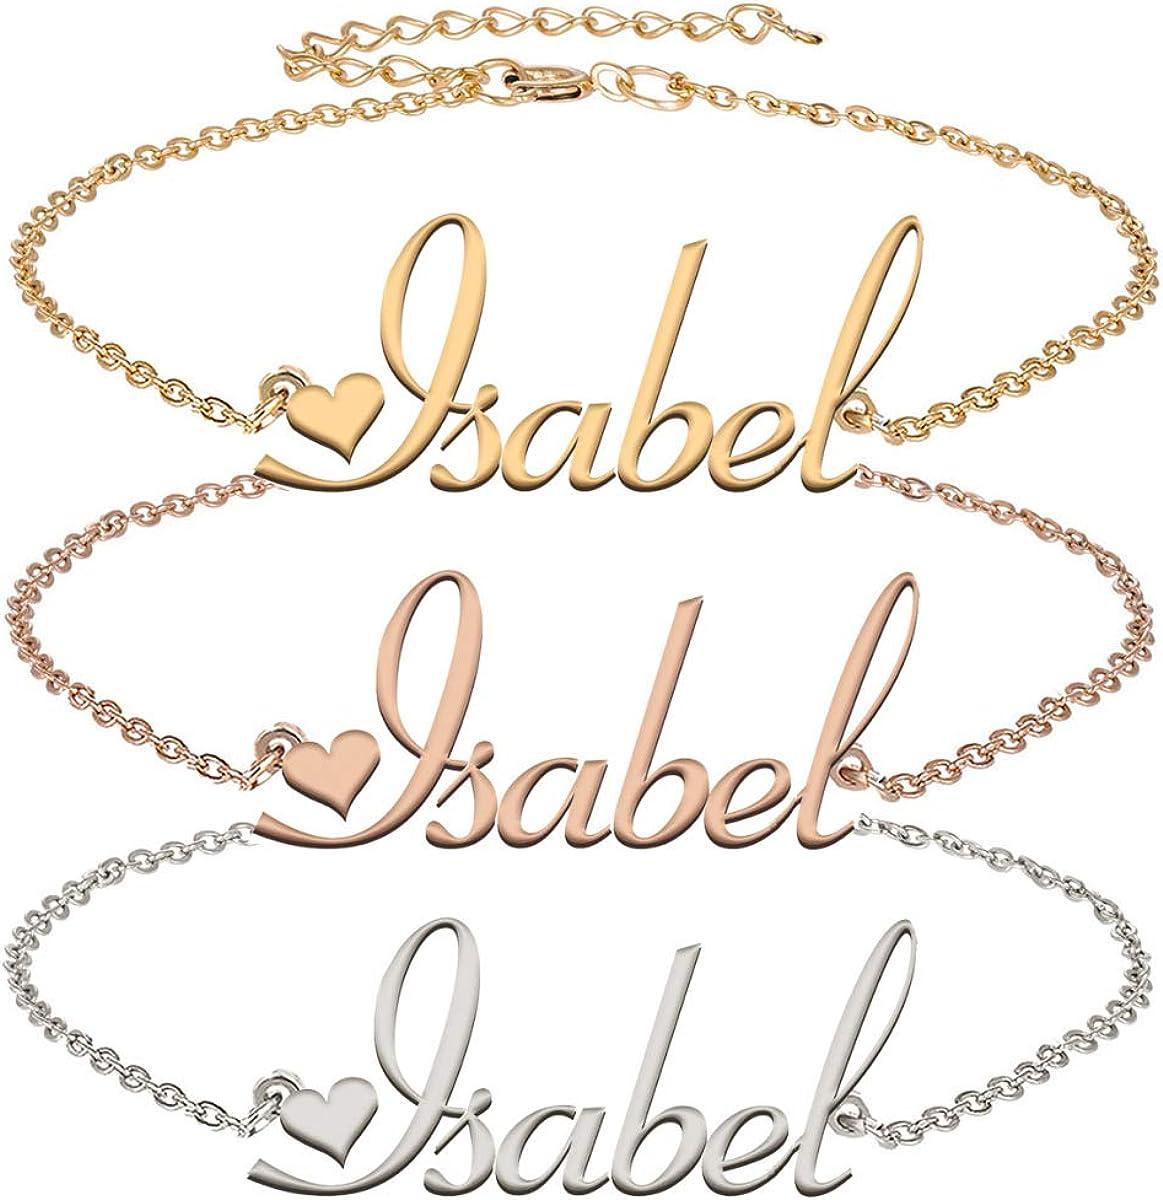 Aoloshow Personalized Cheap Name Necklace Bracelet Made latest Custom Nam Any